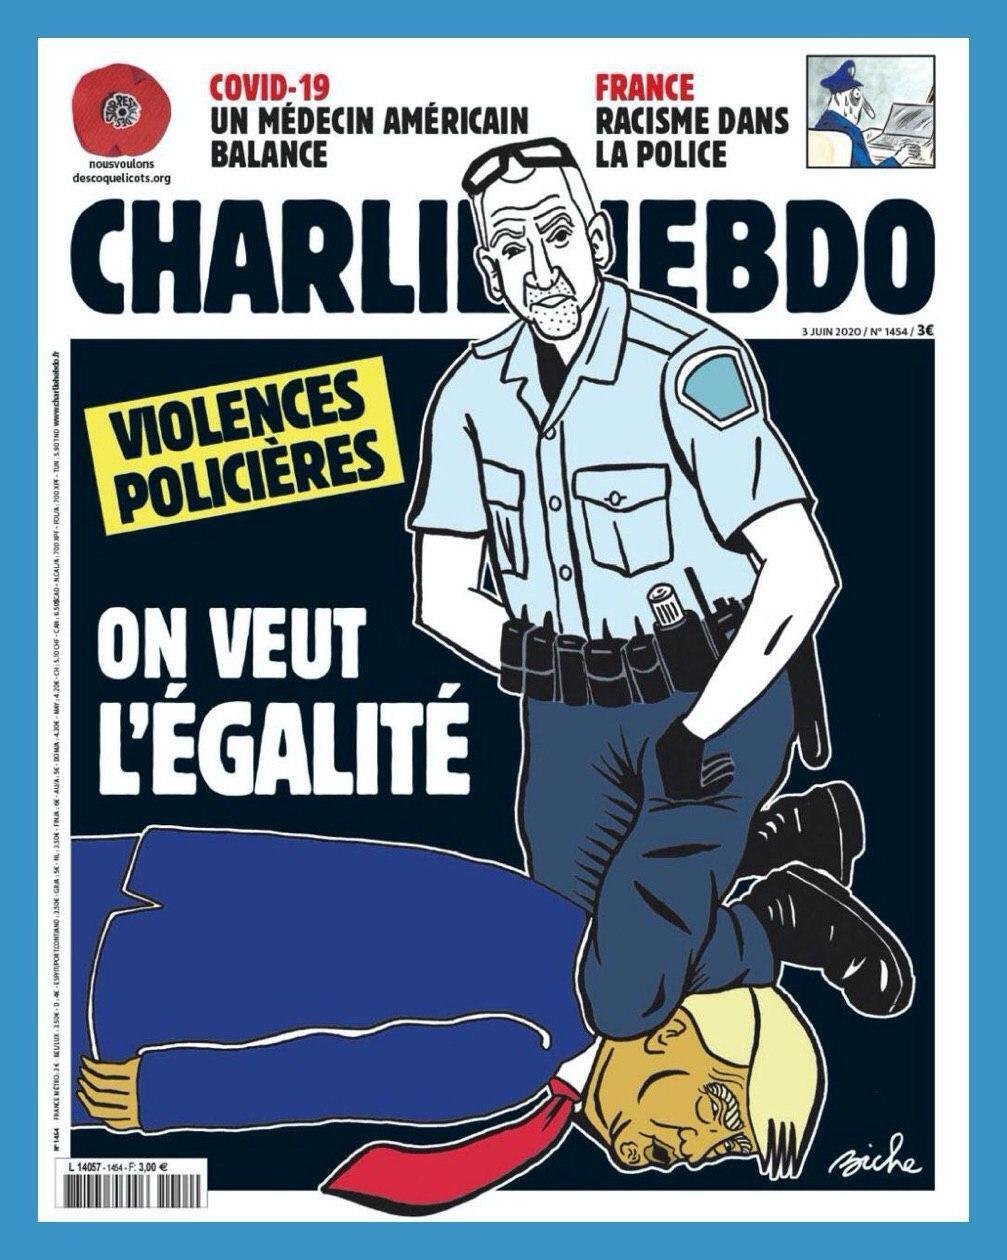 Трампа поместили на обложку скандального журнала Charlie Hebdo